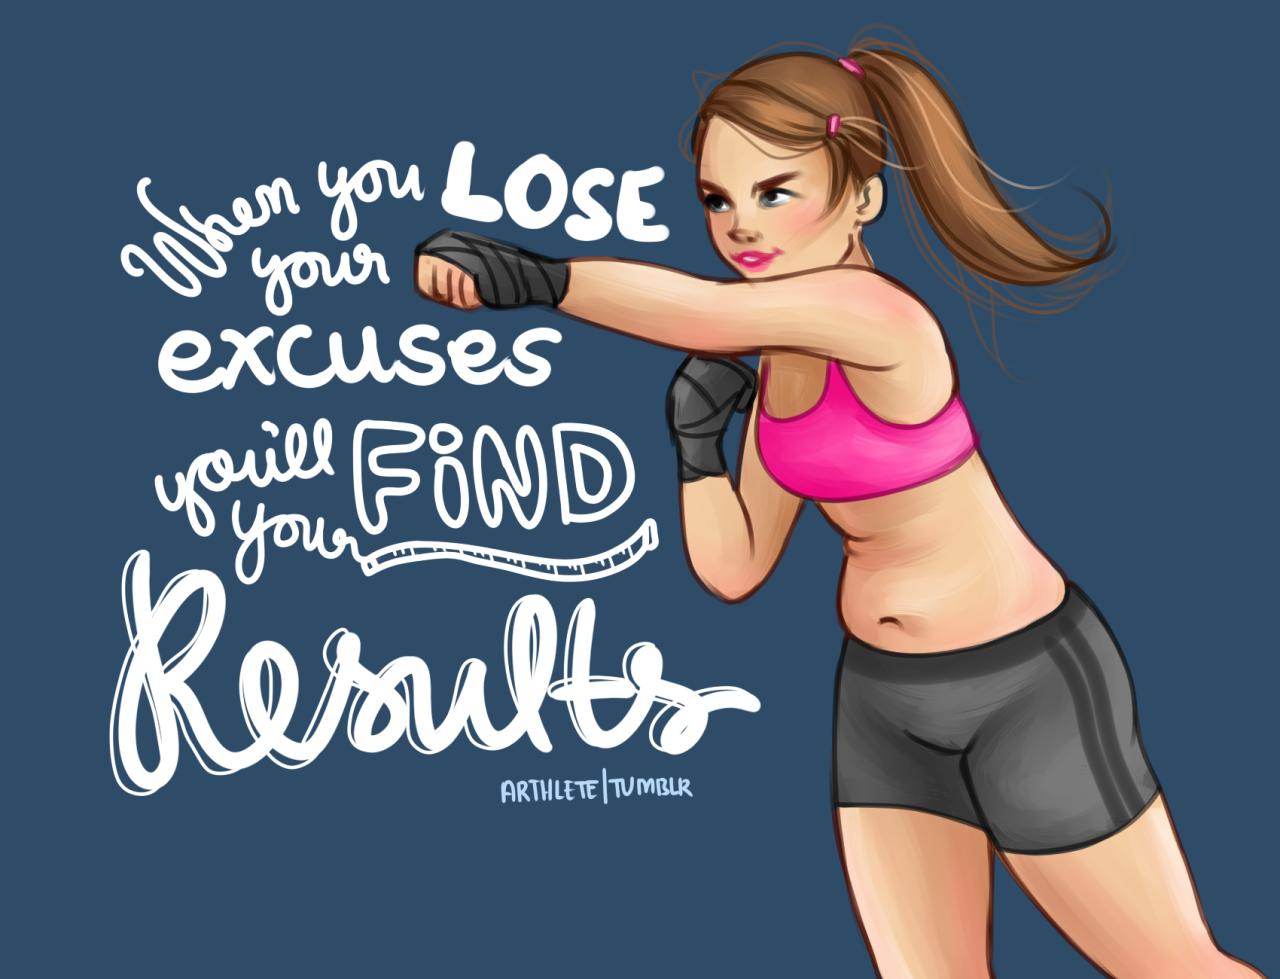 mensagens inspiracionais dieta 10 - grandes mulheres